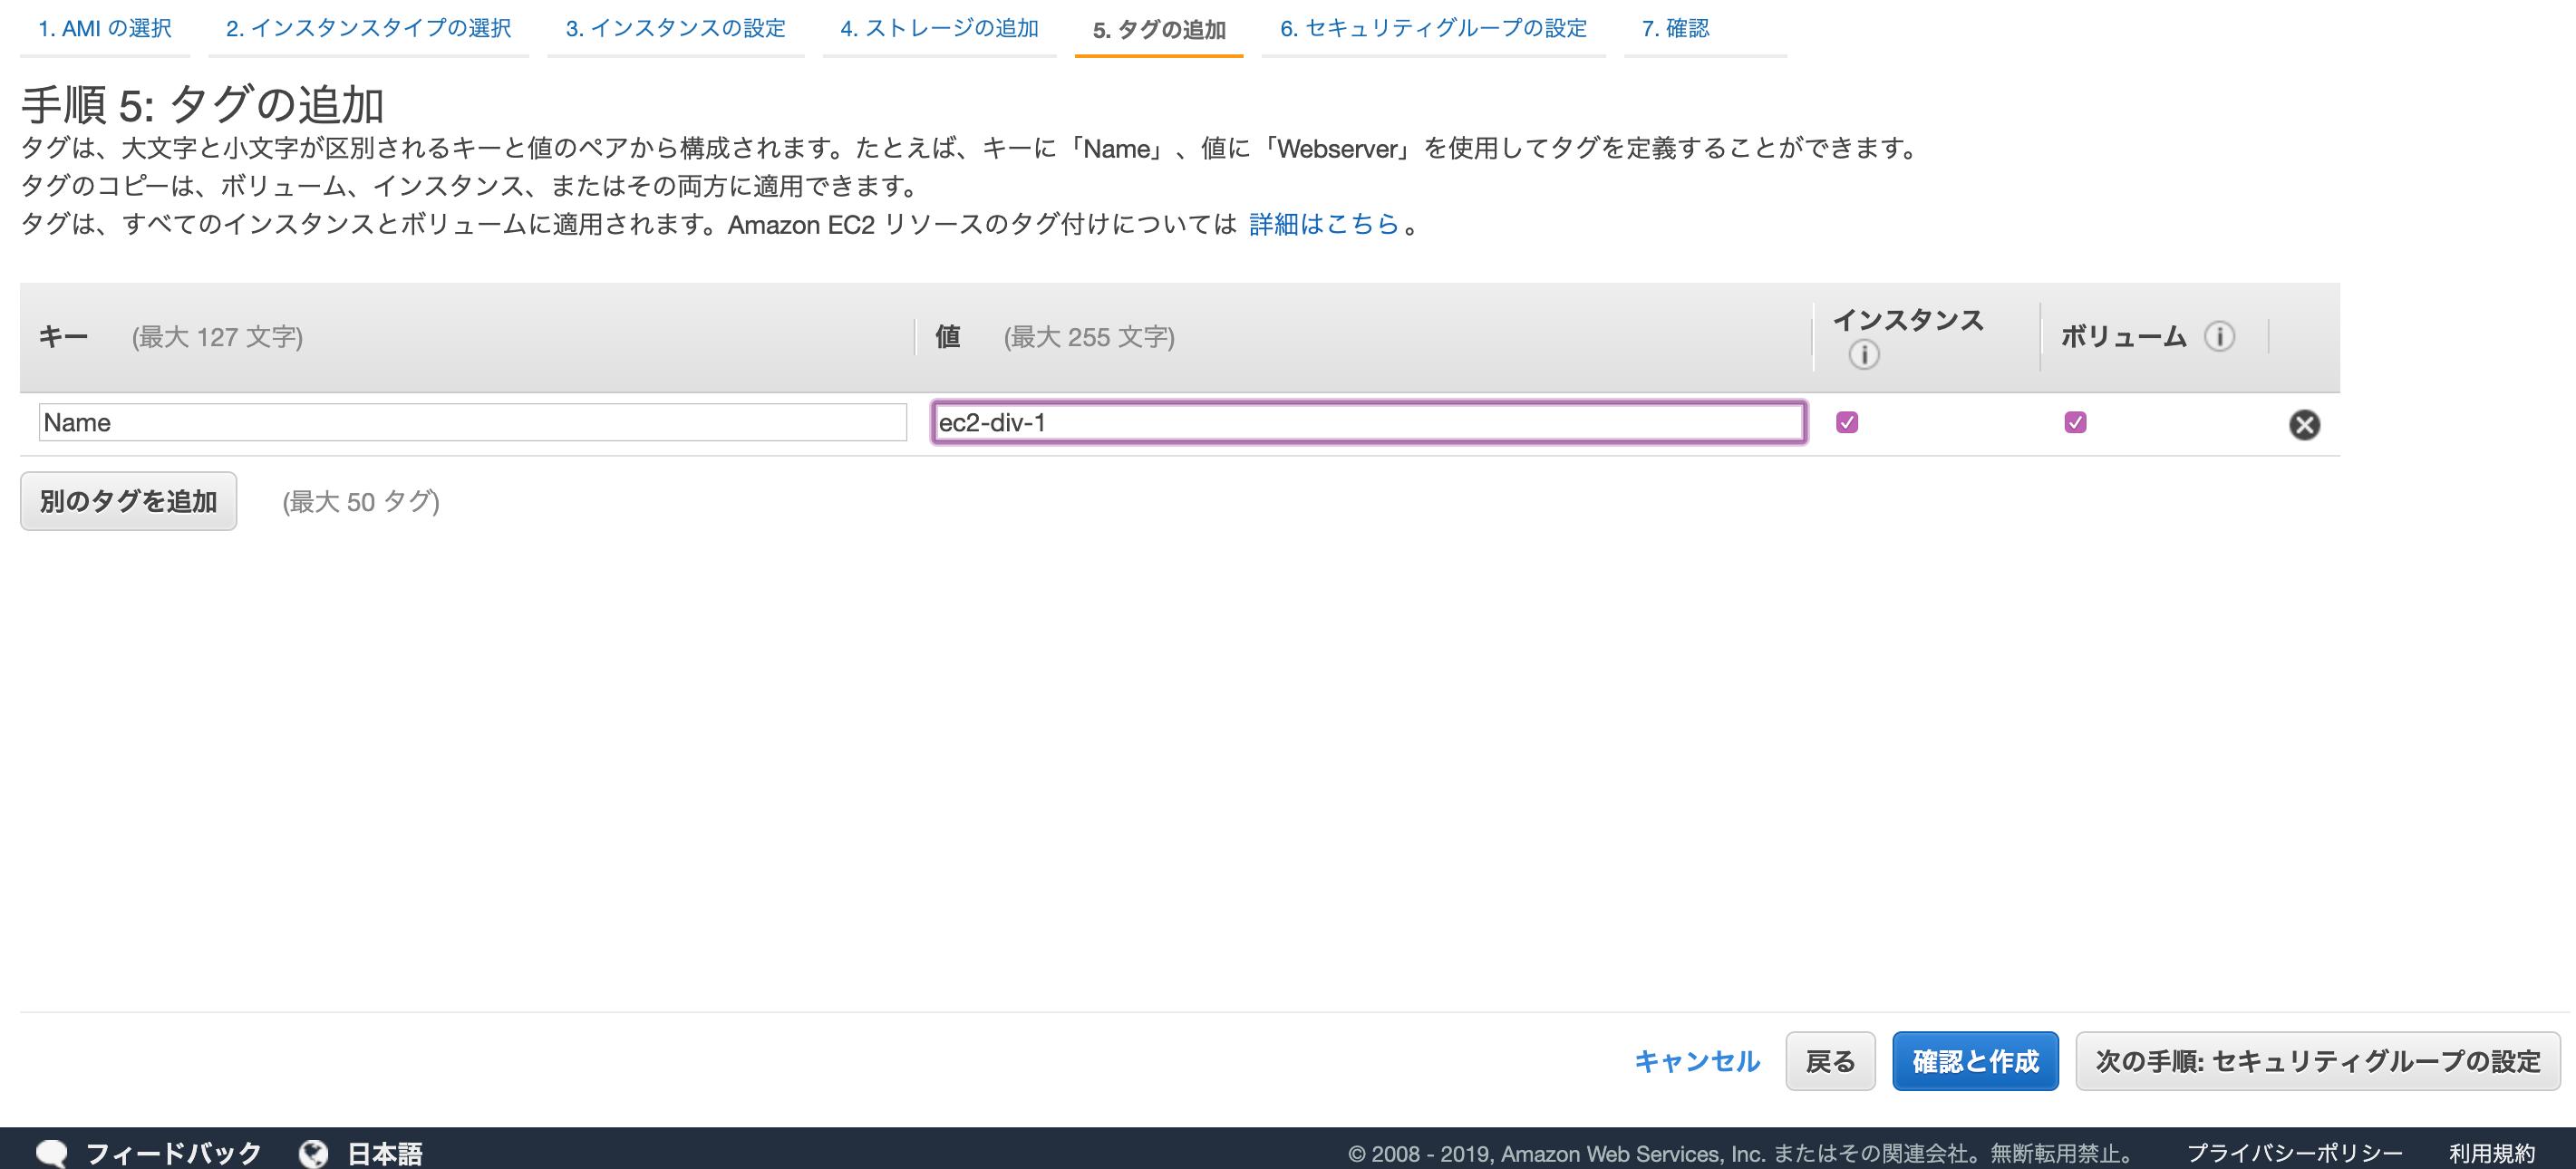 FireShot Capture 038 - インスタンスウィザードを起動 - EC2 Management Console_ - ap-northeast-1.console.aws.amazon.com.png